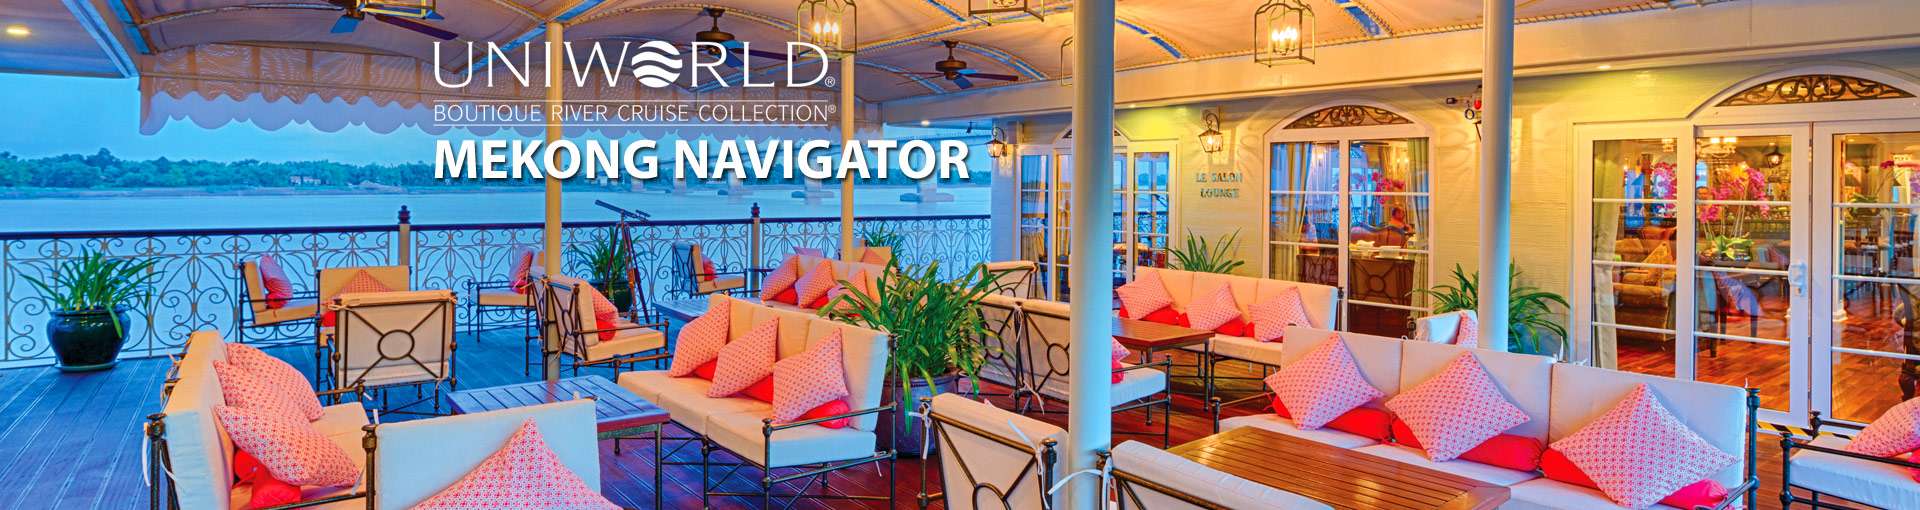 Uniworld River Cruises Mekong Navigator River Ship